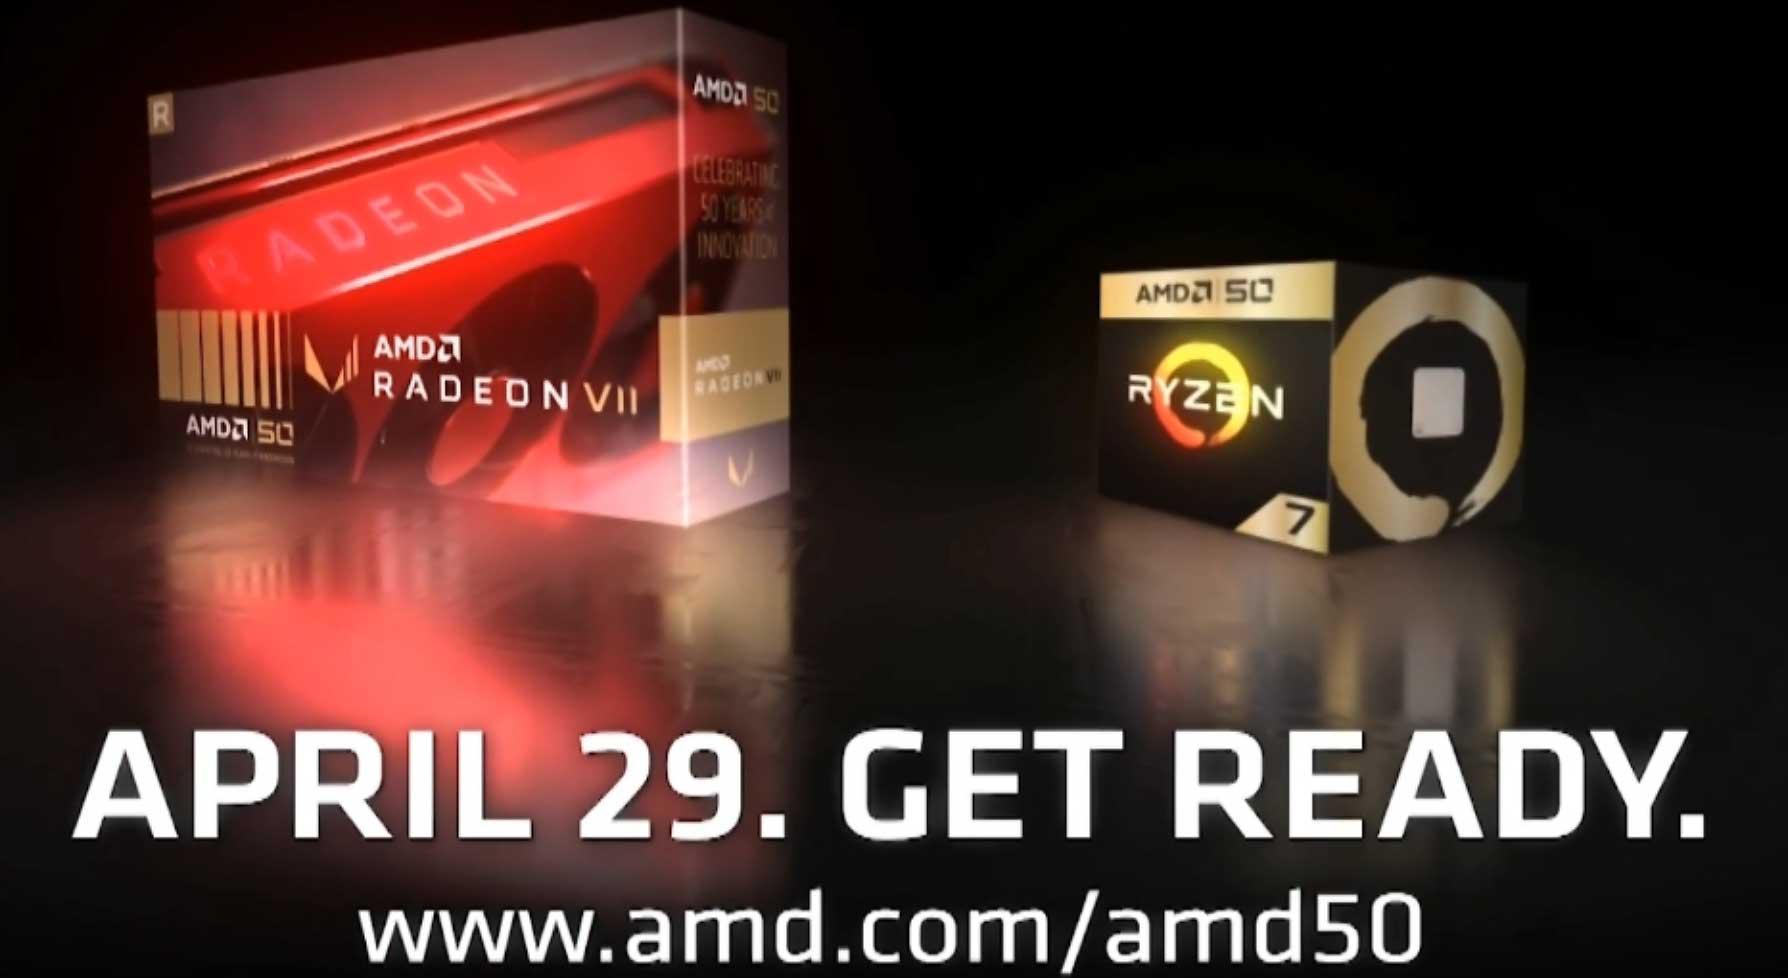 AMD-50-aniversario-GPU-y-CPU